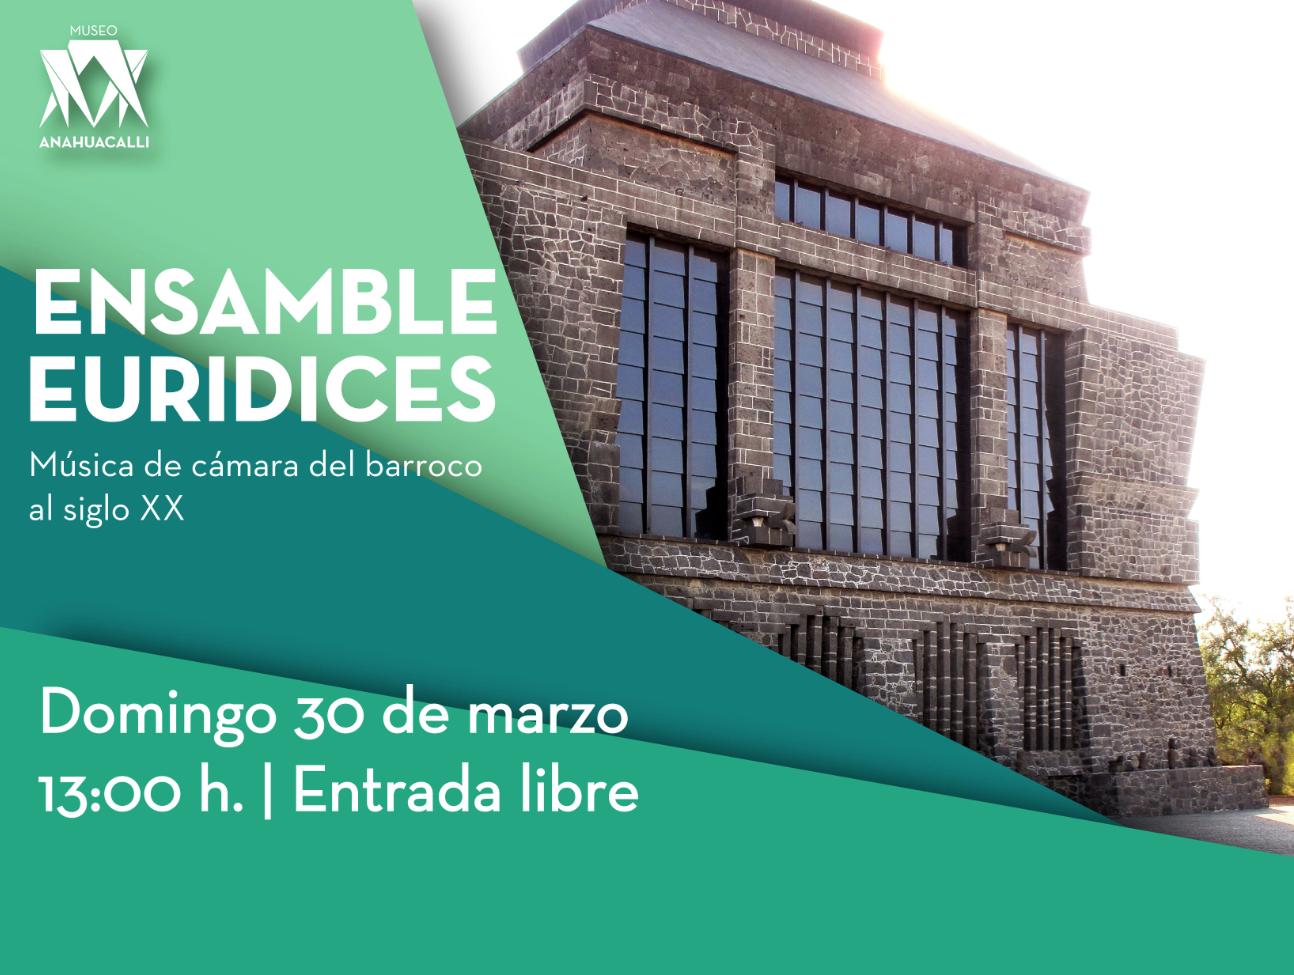 Ensamble Euridices: Música de cámara en el Museo Anahuacalli